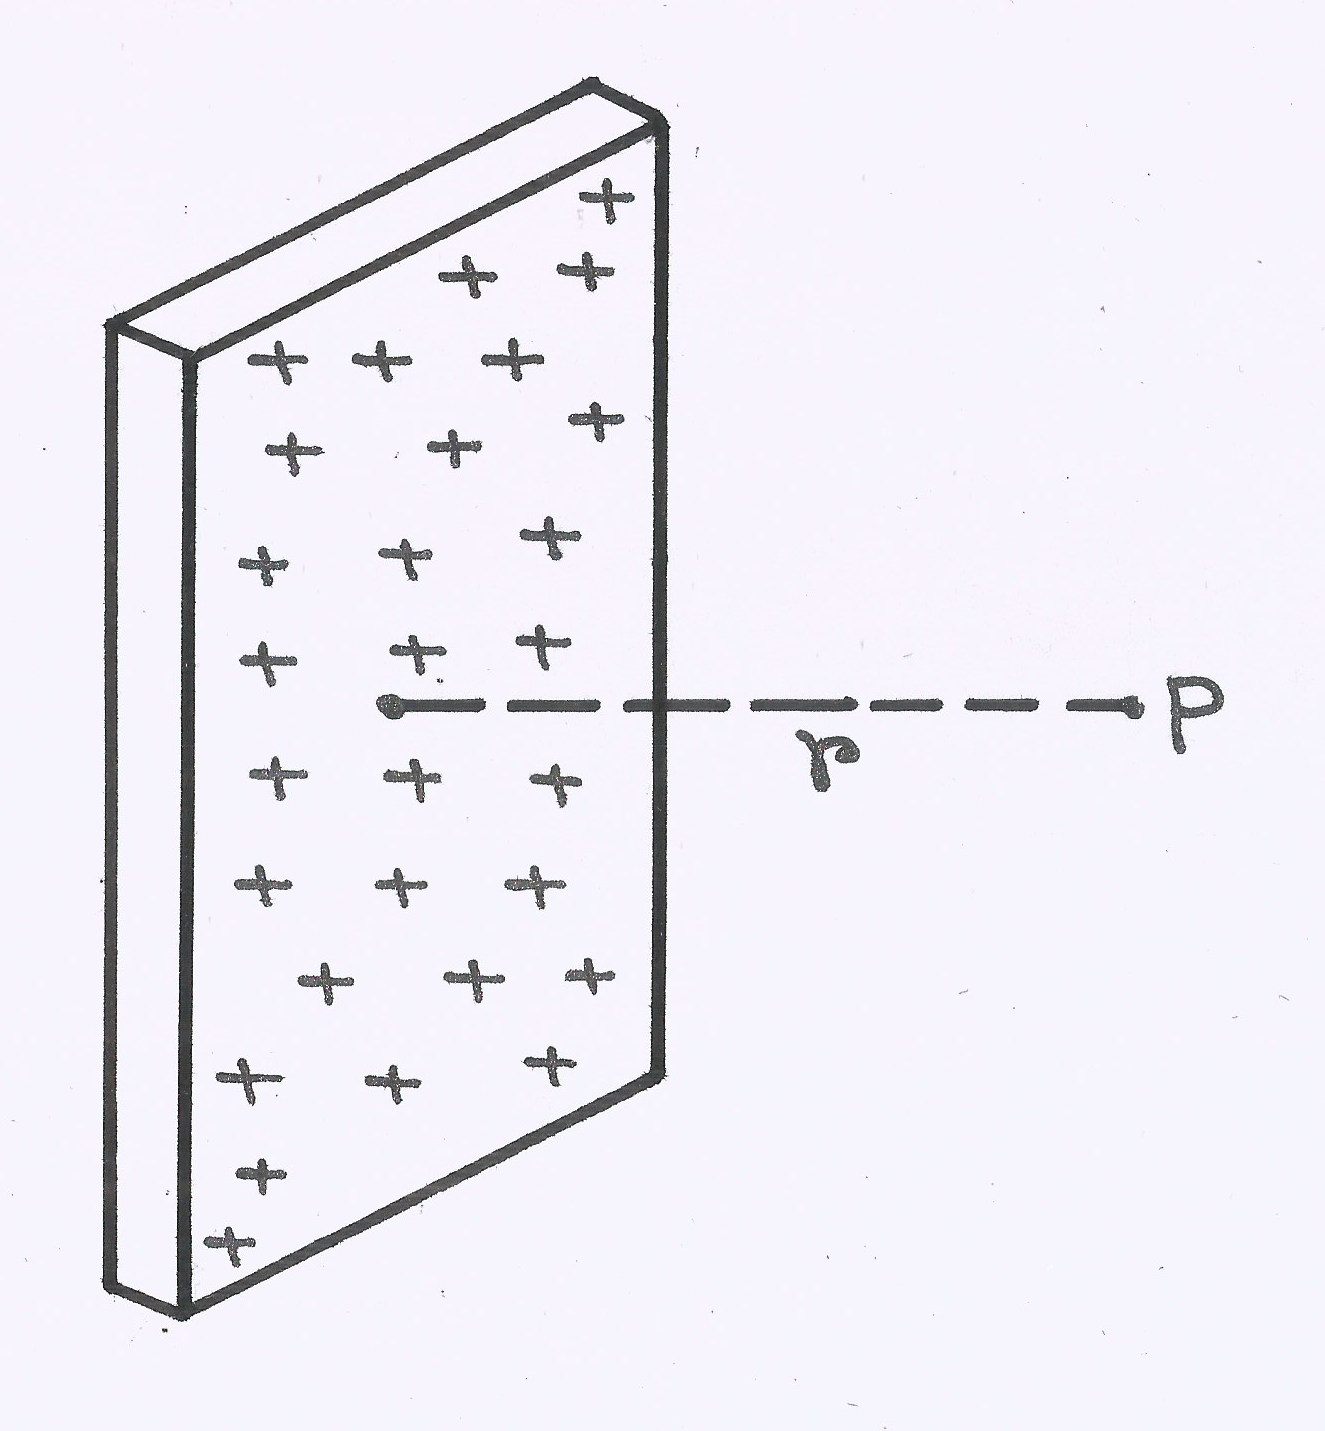 Neet Jee Essential Theory Electrostatics Part I